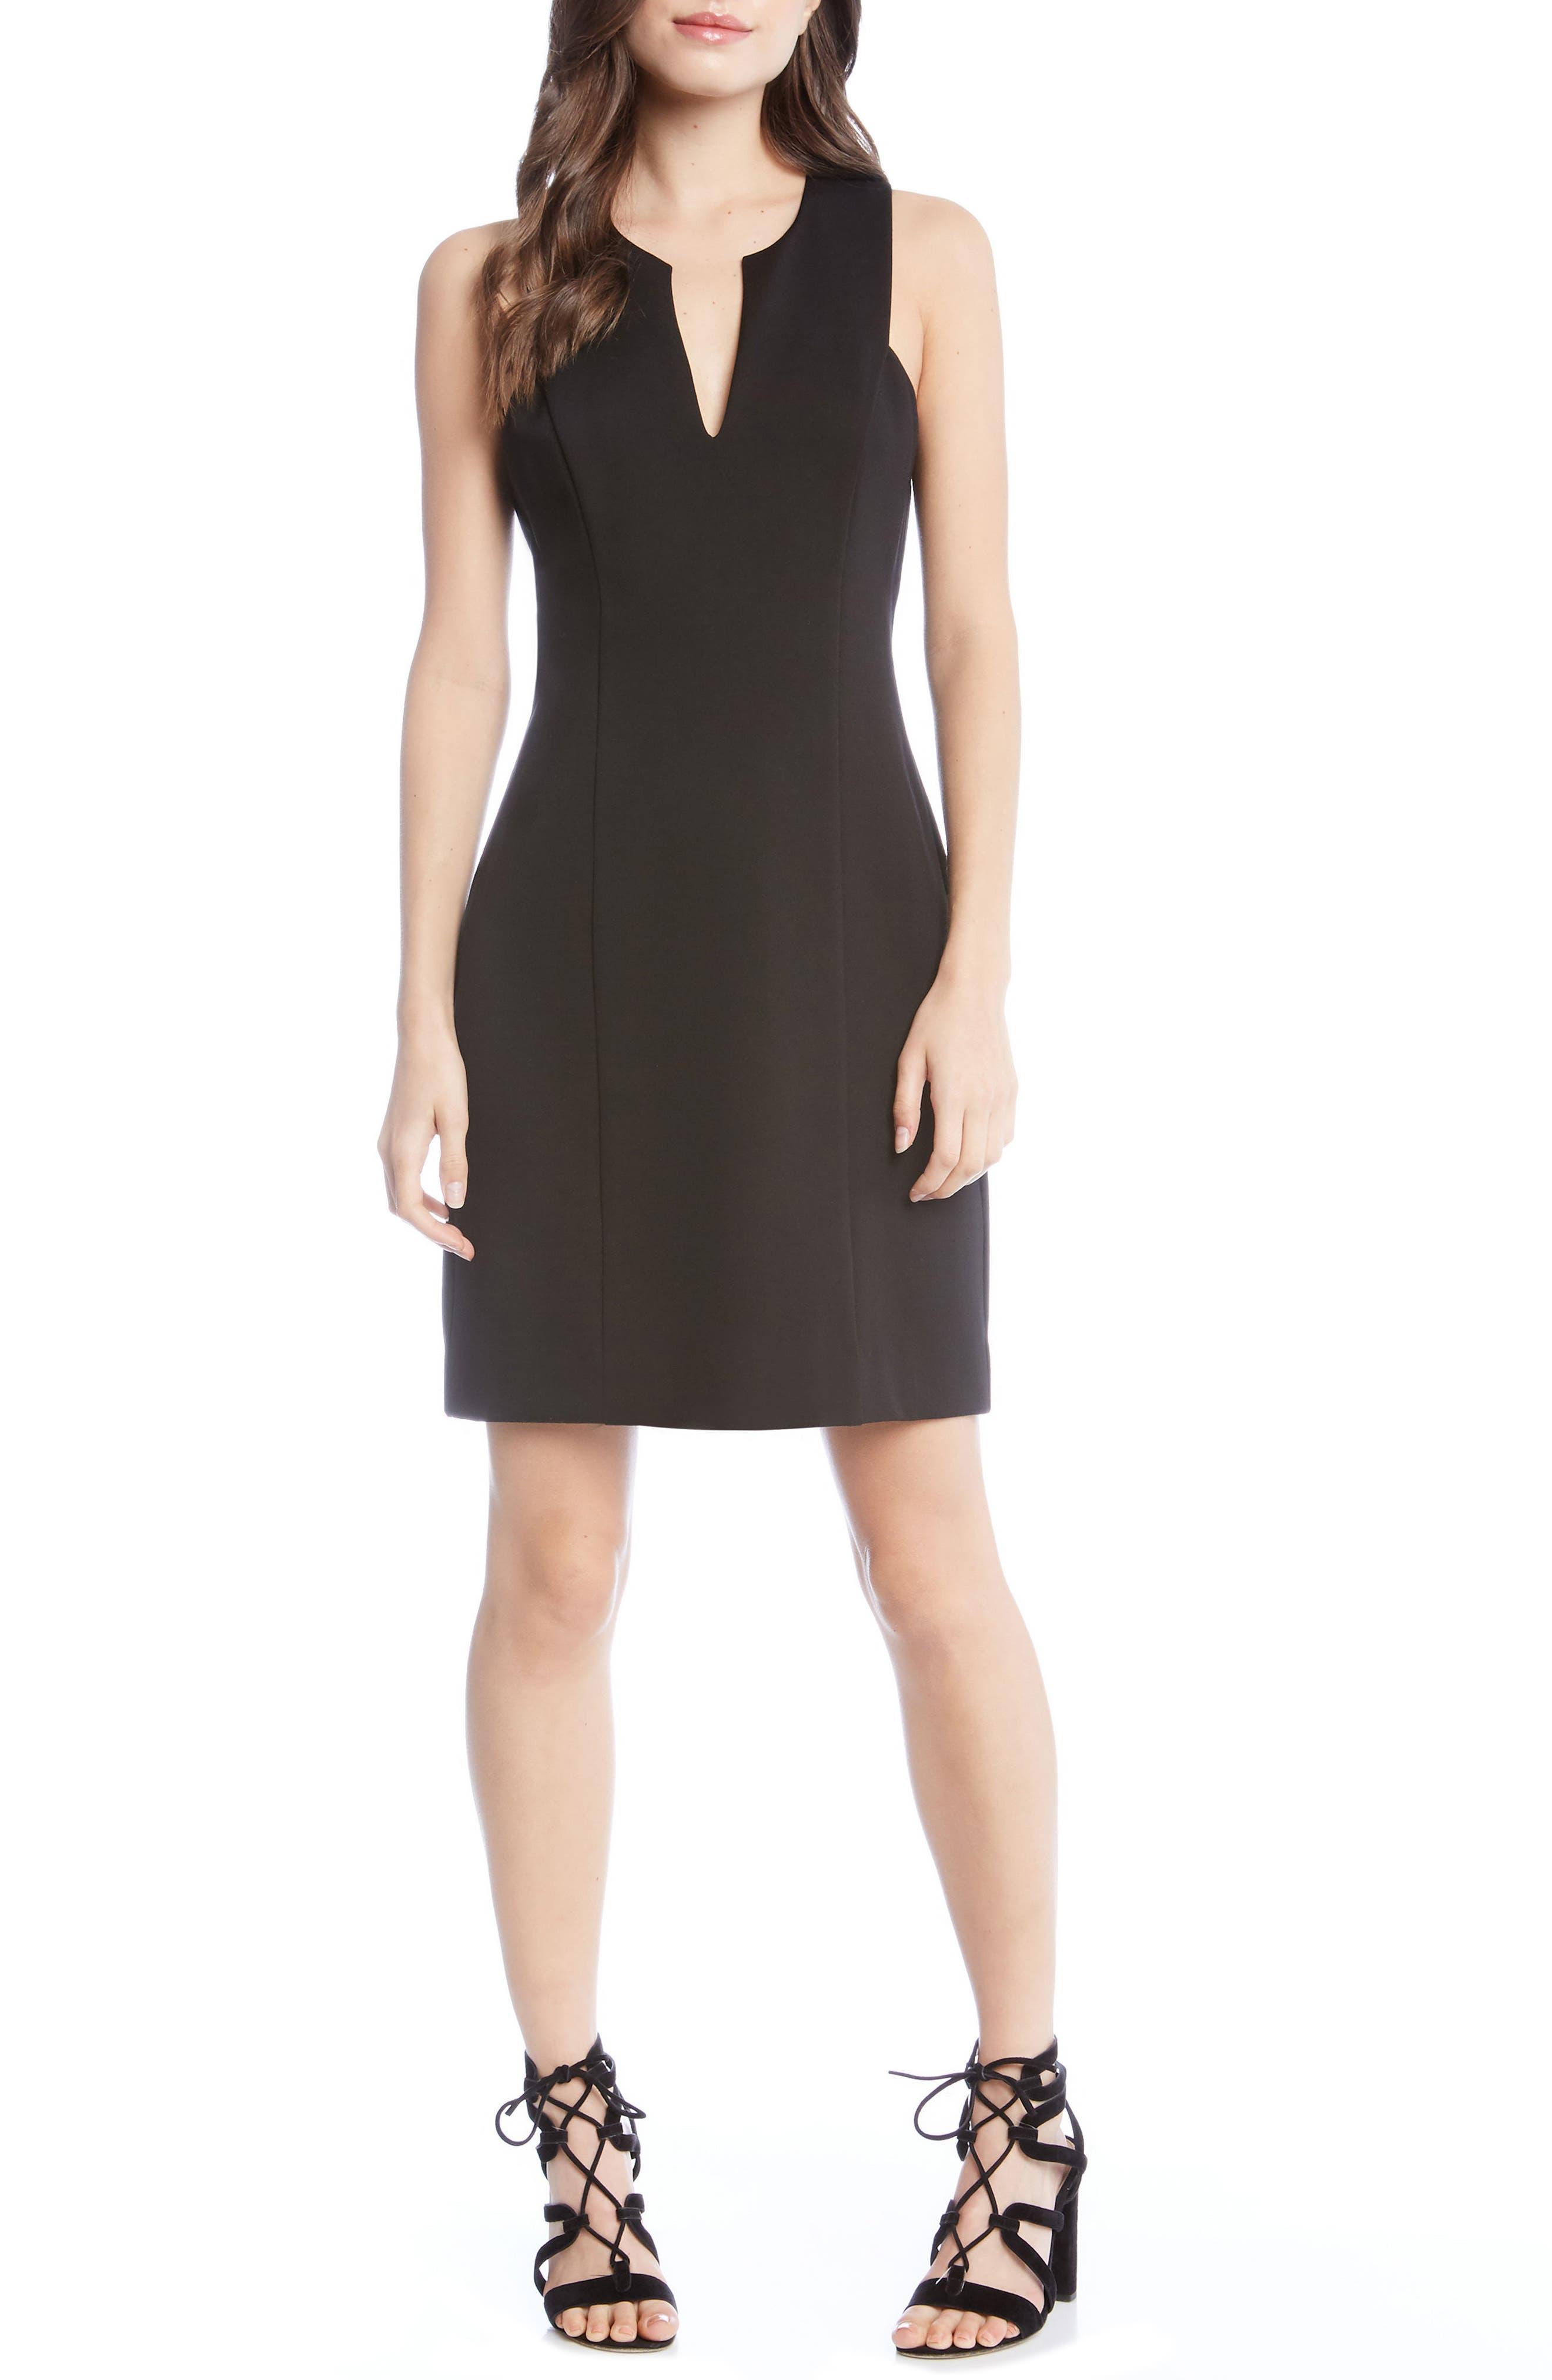 KAREN KANE Stretch Sheath Dress, Main, color, 001